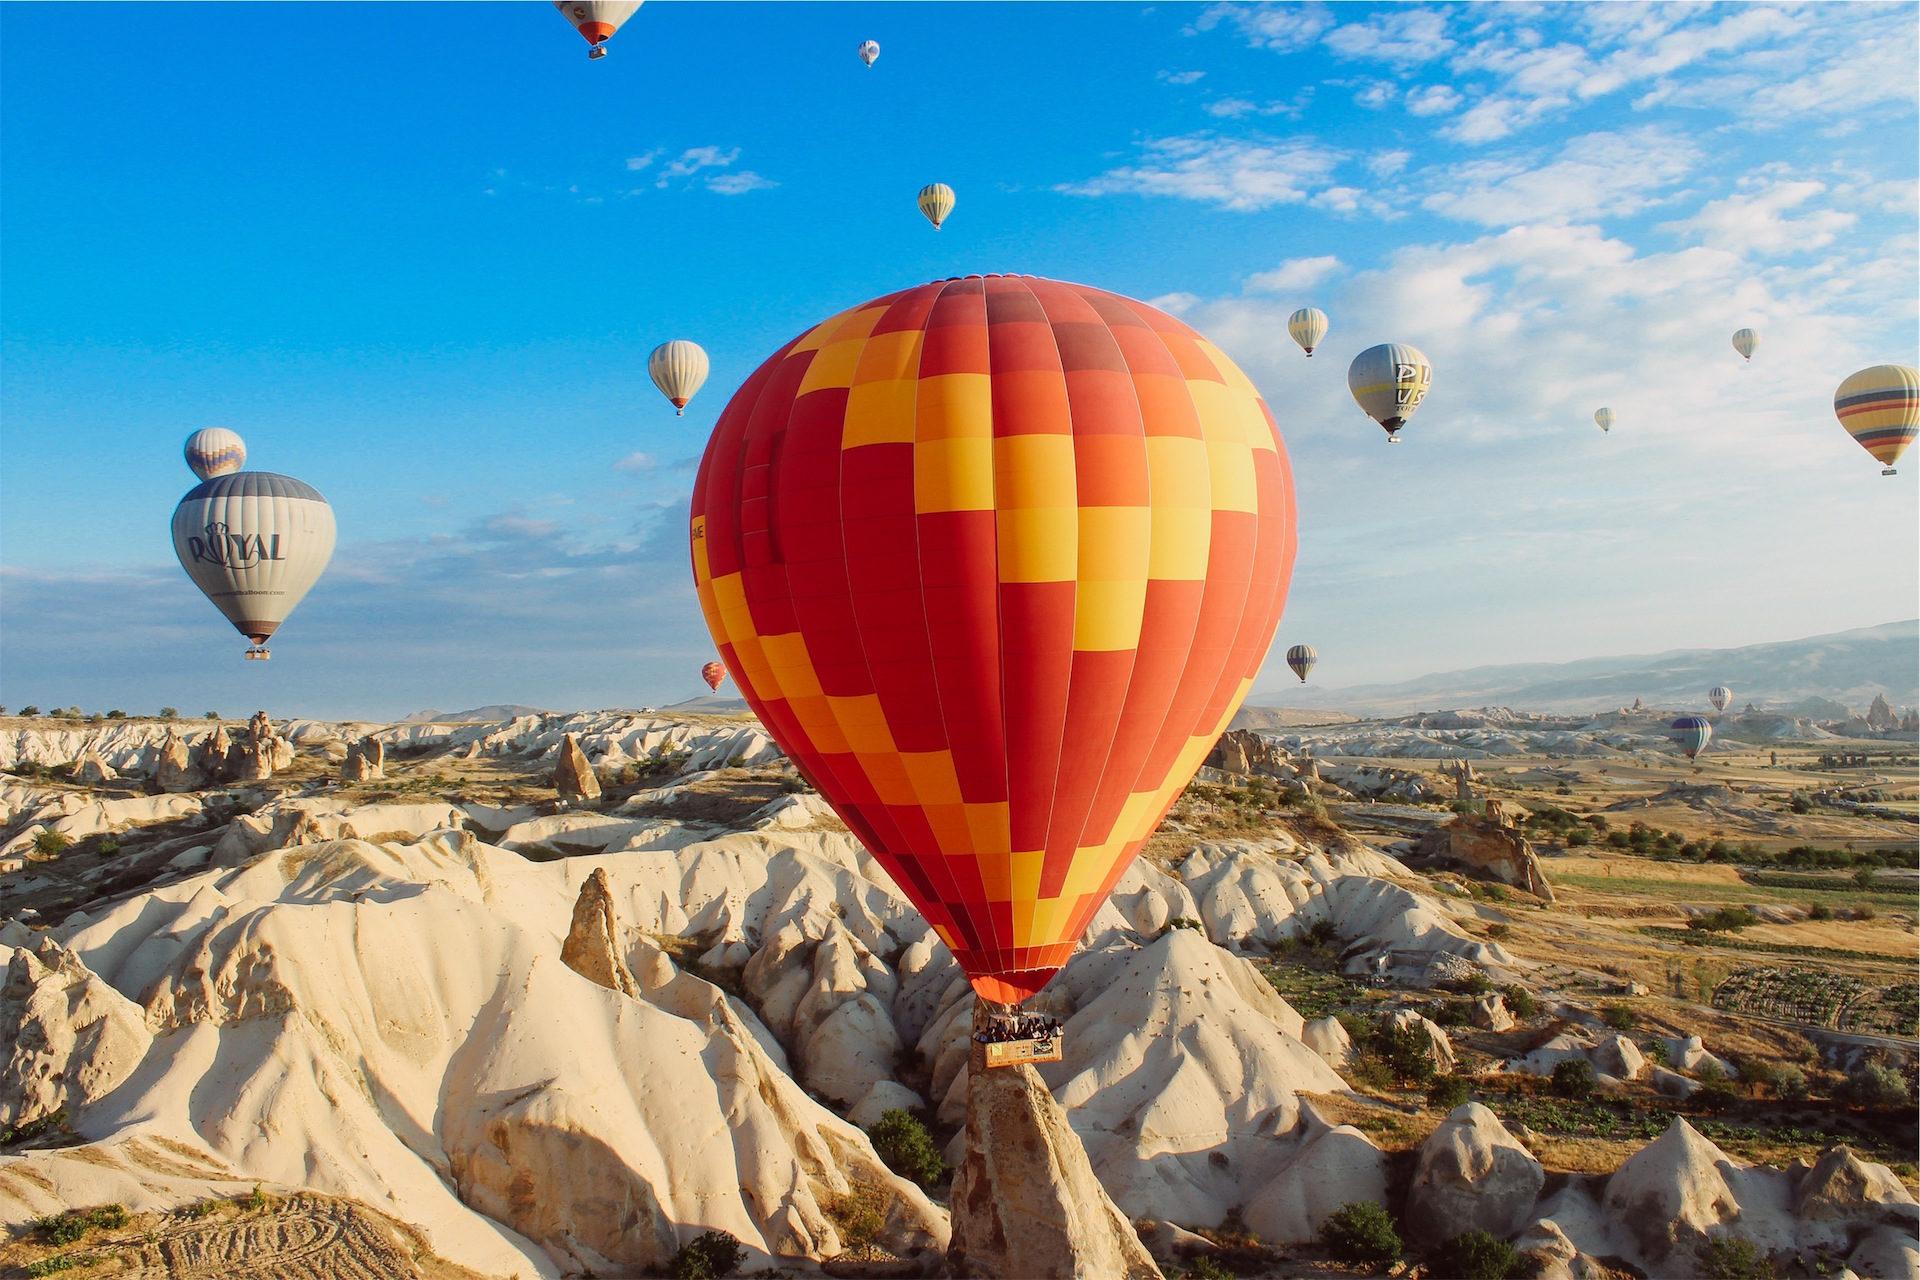 globos, हवा, रेगिस्तान, बार देखे गए, aéreas - HD वॉलपेपर - प्रोफेसर-falken.com